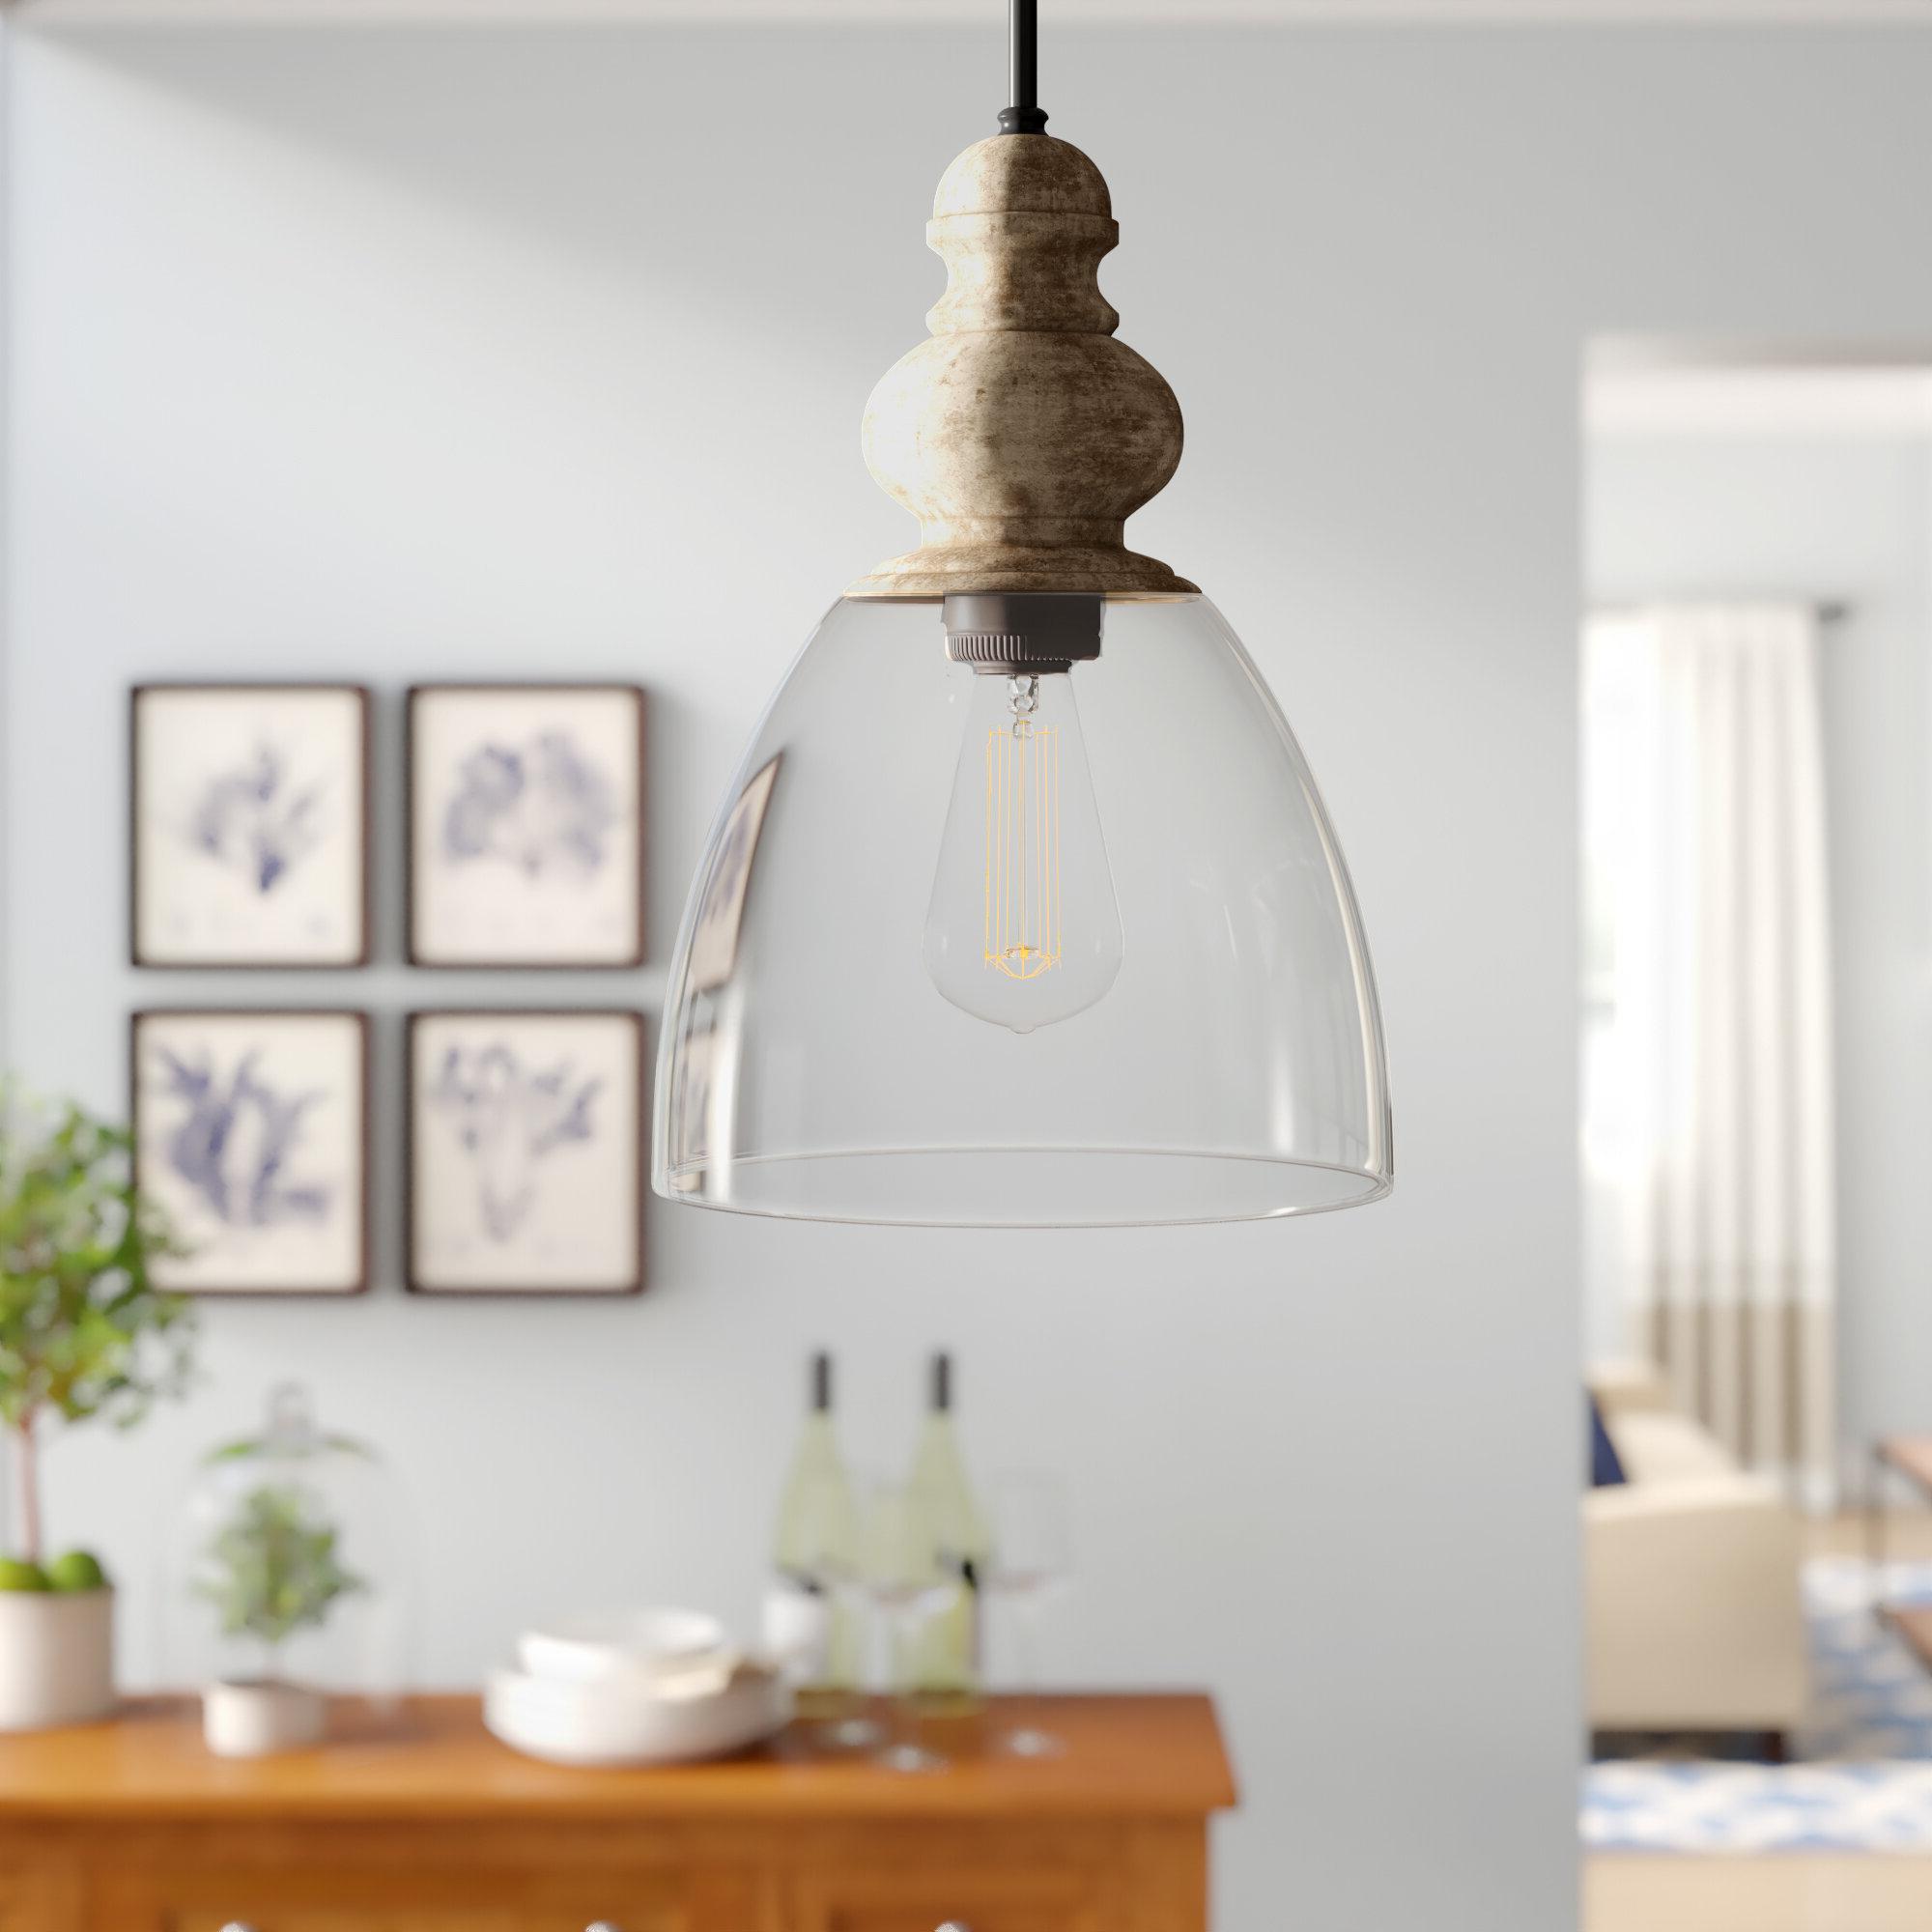 Fashionable Monadnock 1 Light Single Dome Pendants Pertaining To Farmhouse & Rustic Black Pendants (View 8 of 25)